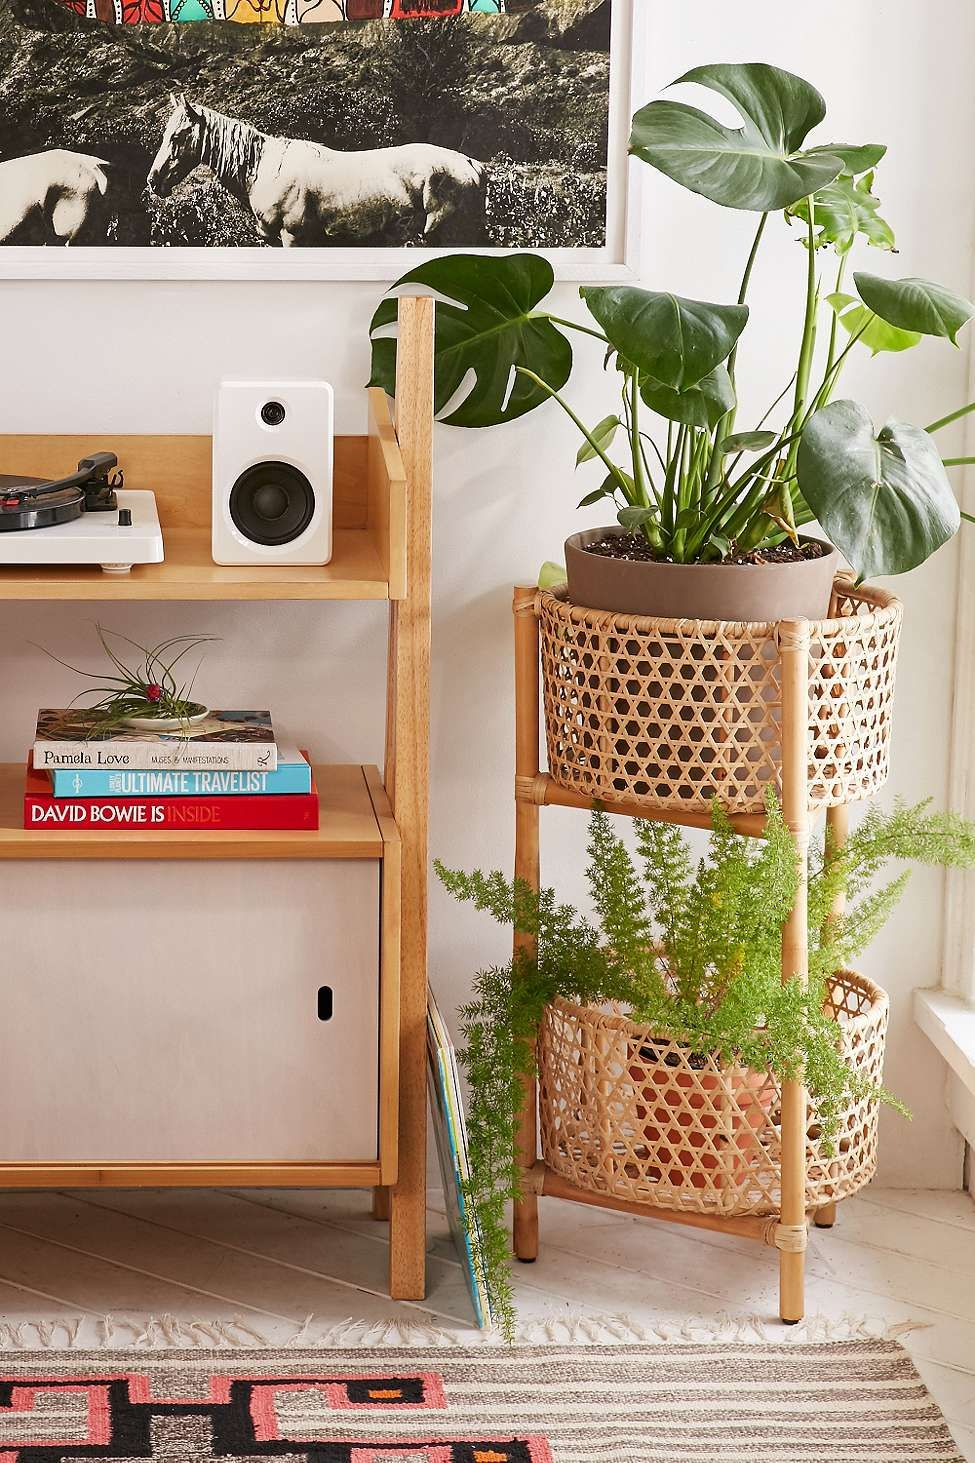 zweistufiges regal aus rattan spontane fundst cke pinterest rattan regal und fundst cke. Black Bedroom Furniture Sets. Home Design Ideas